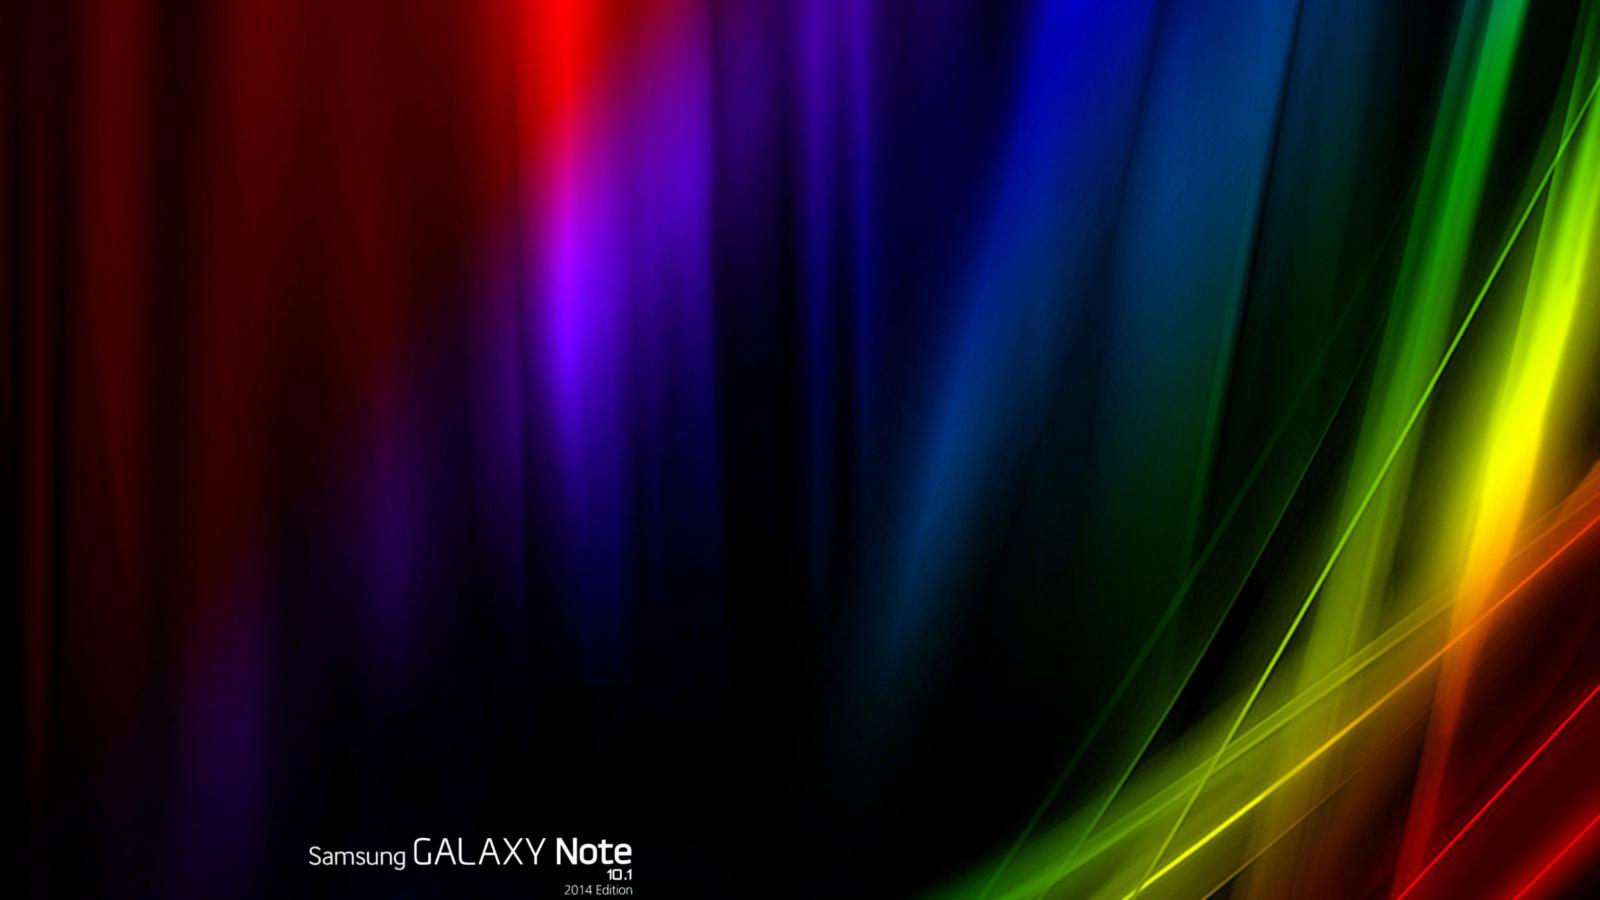 Samsung Galaxy Note 10 Wallpaper For Widescreen Desktop Pc